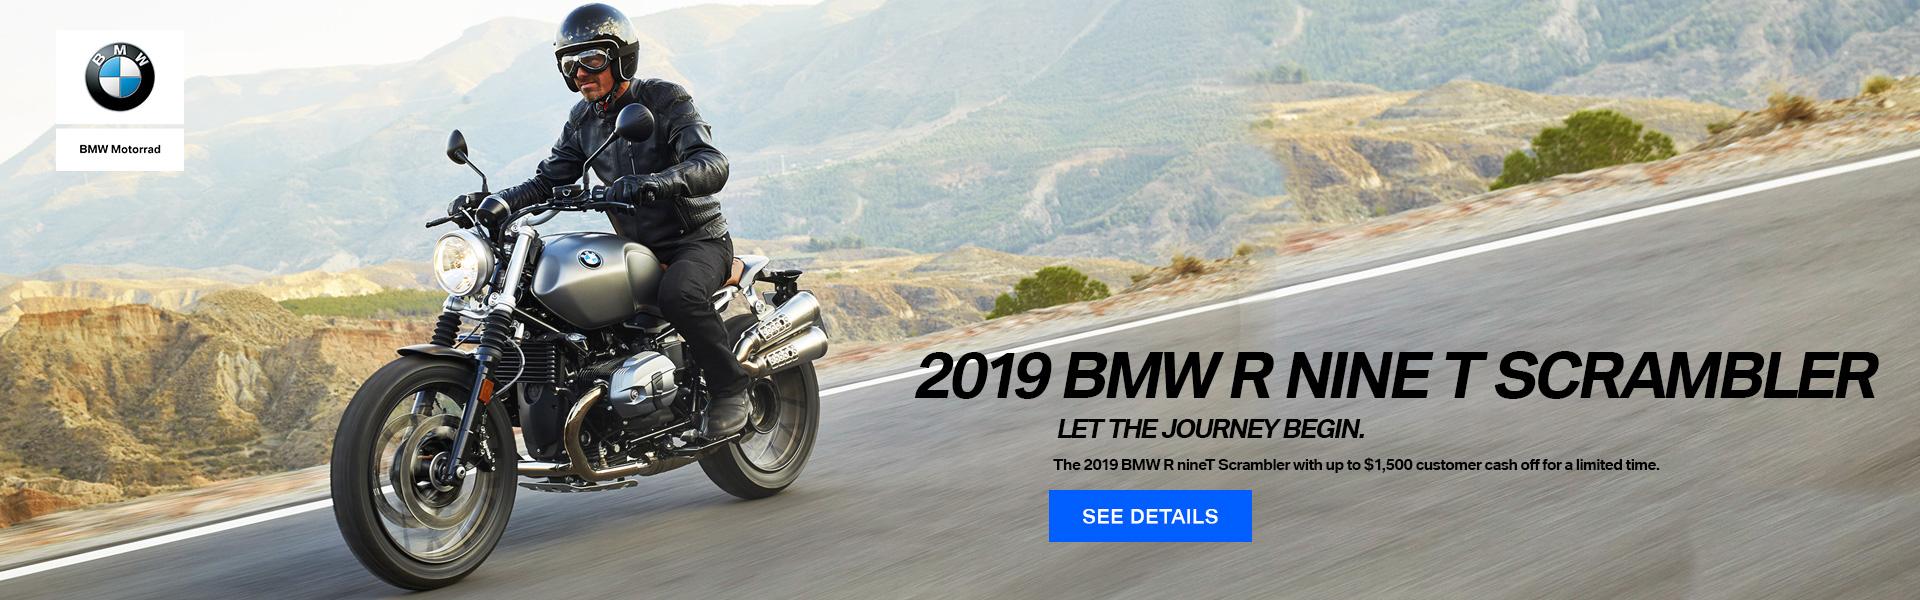 2019 BMW RnineT Scrambler